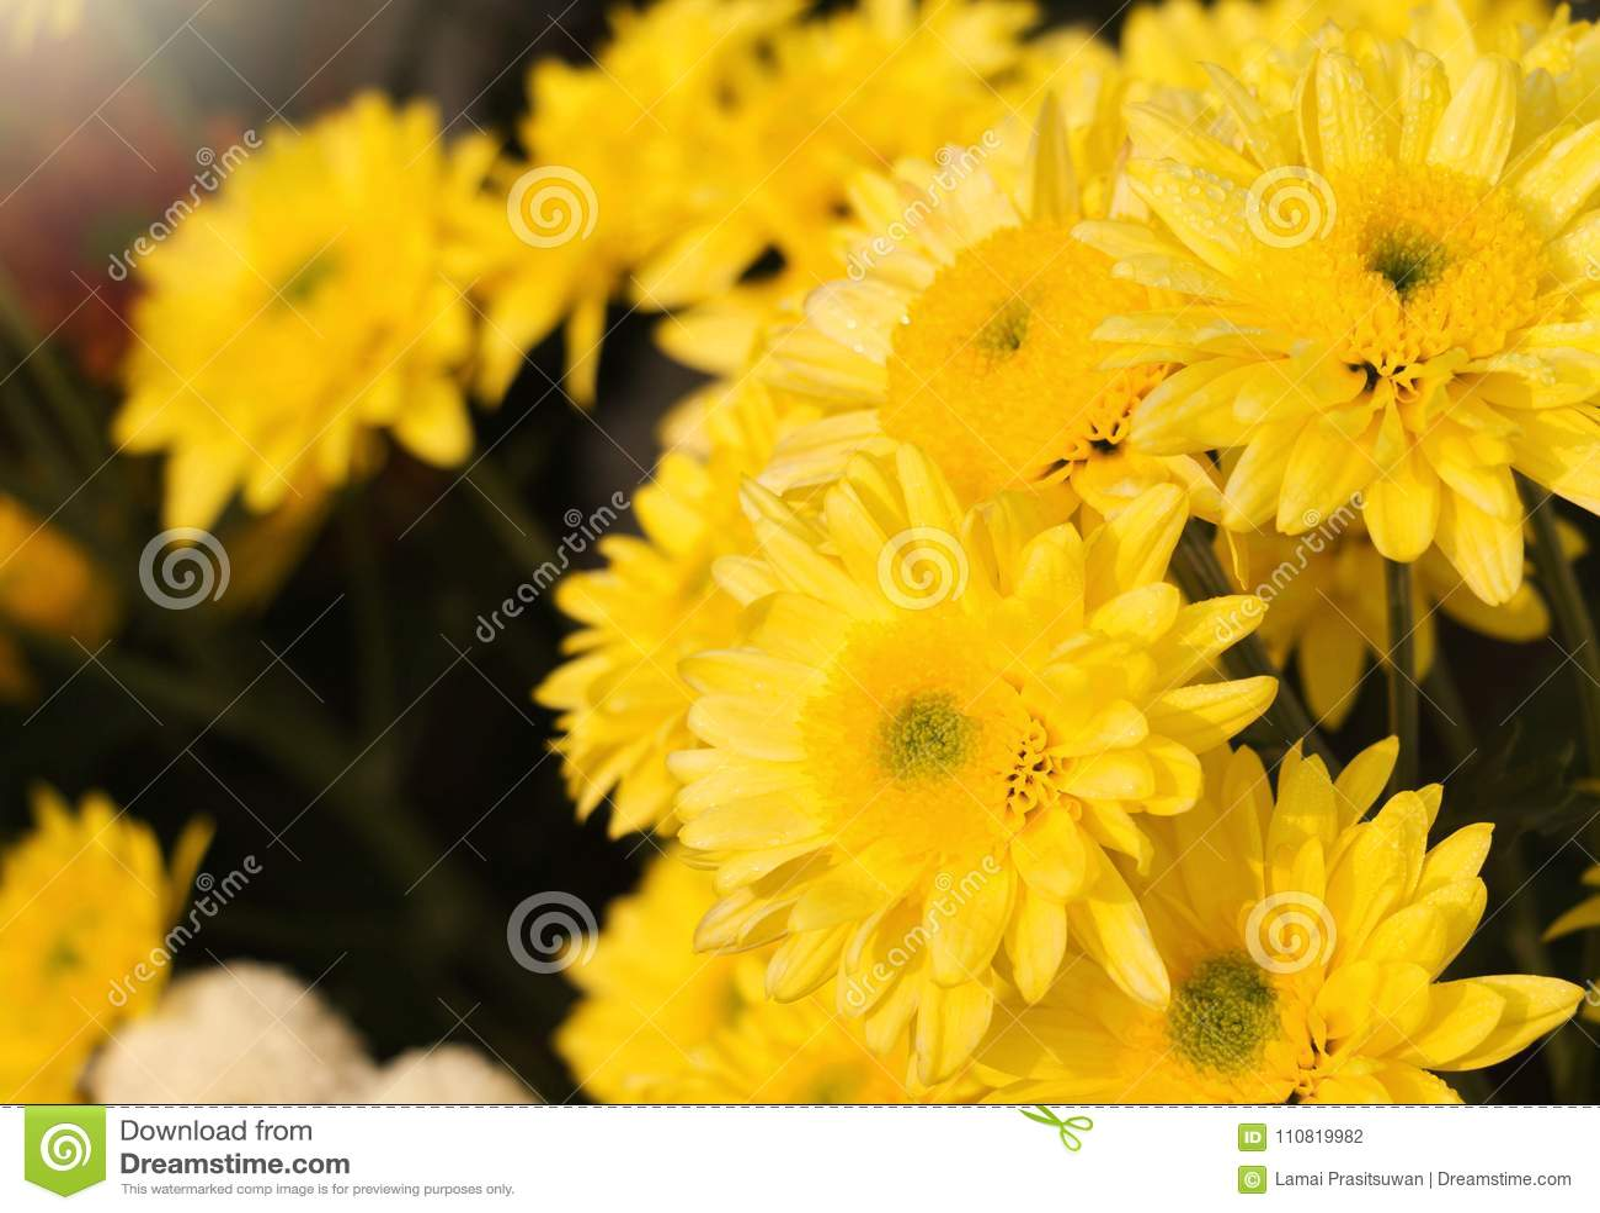 Yellow Chrysanthemum Flowers In Garden Stock Photo Image Of Petal